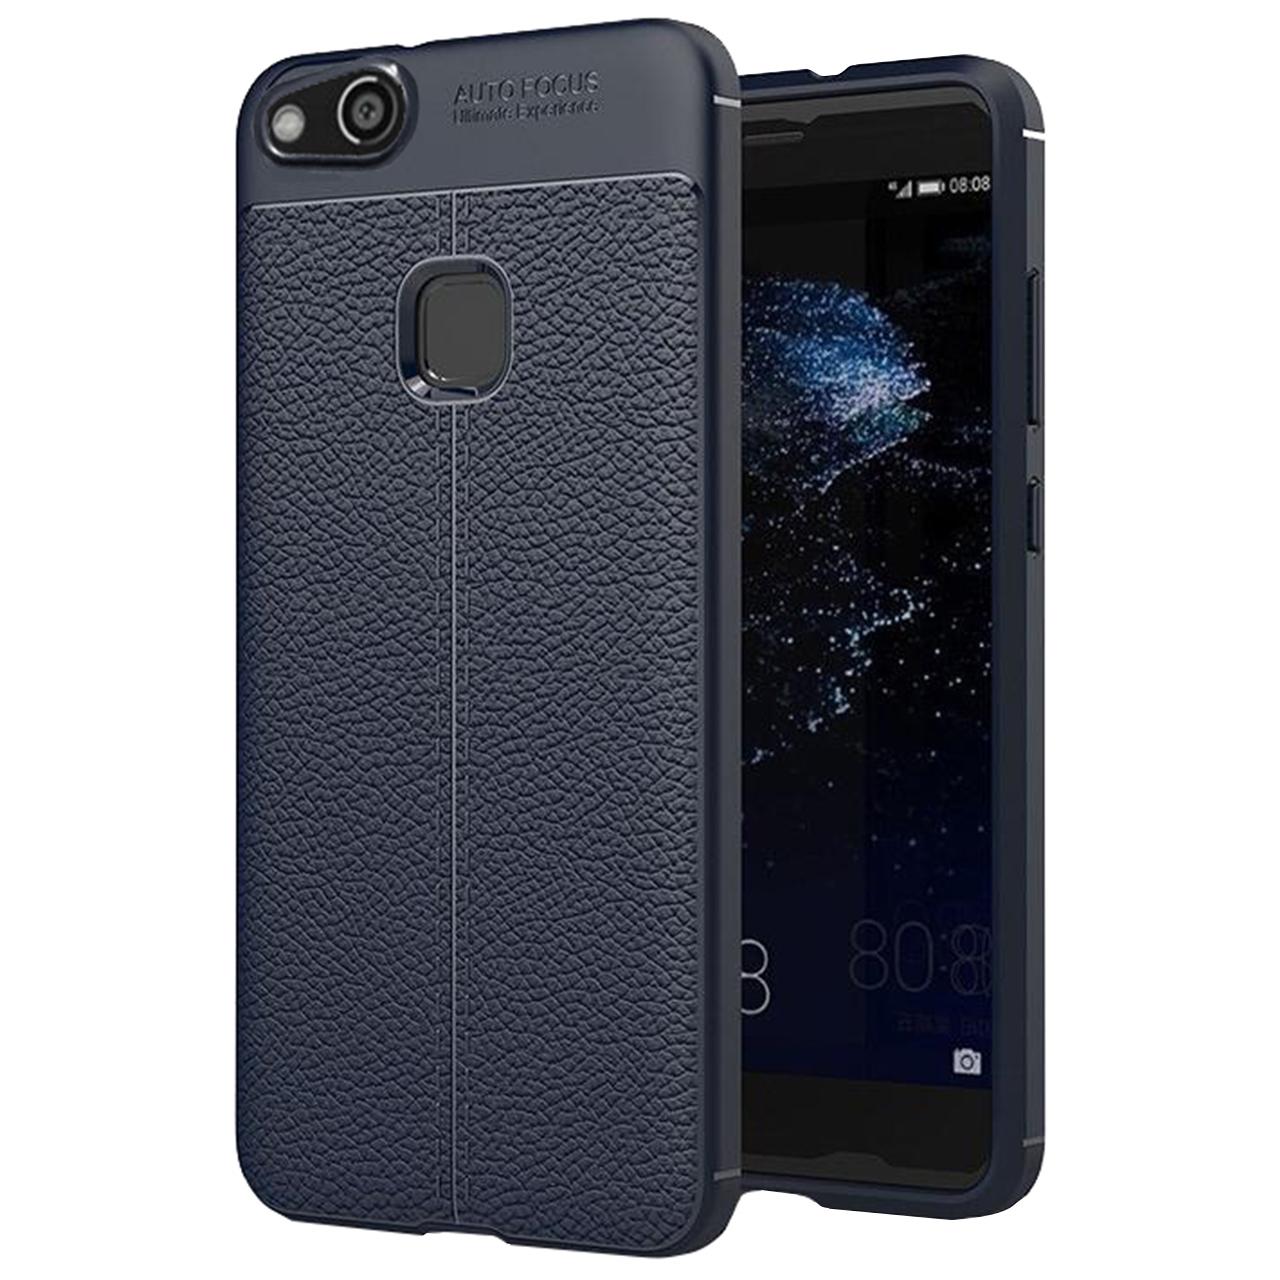 کاور طرح چرمی اتو فوکوس مدل Ultimate Experience مناسب برای گوشی موبایل هواوی p10 lite